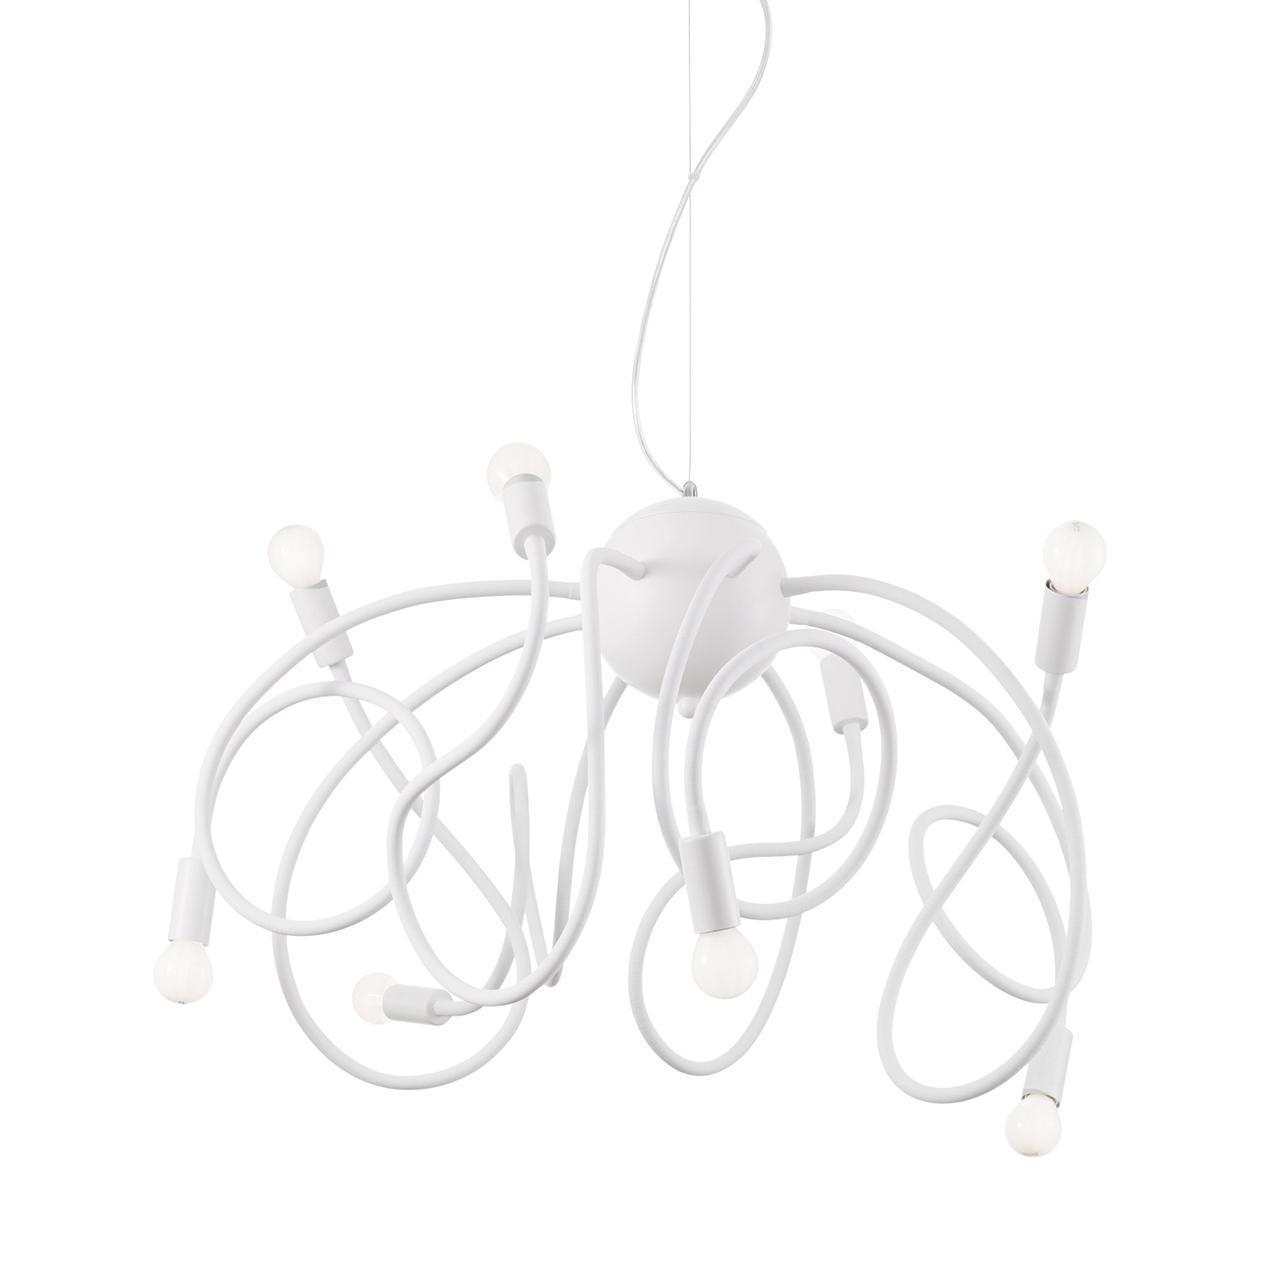 Люстра Ideal Lux Multiflex SP8 Bianco подвесная цена